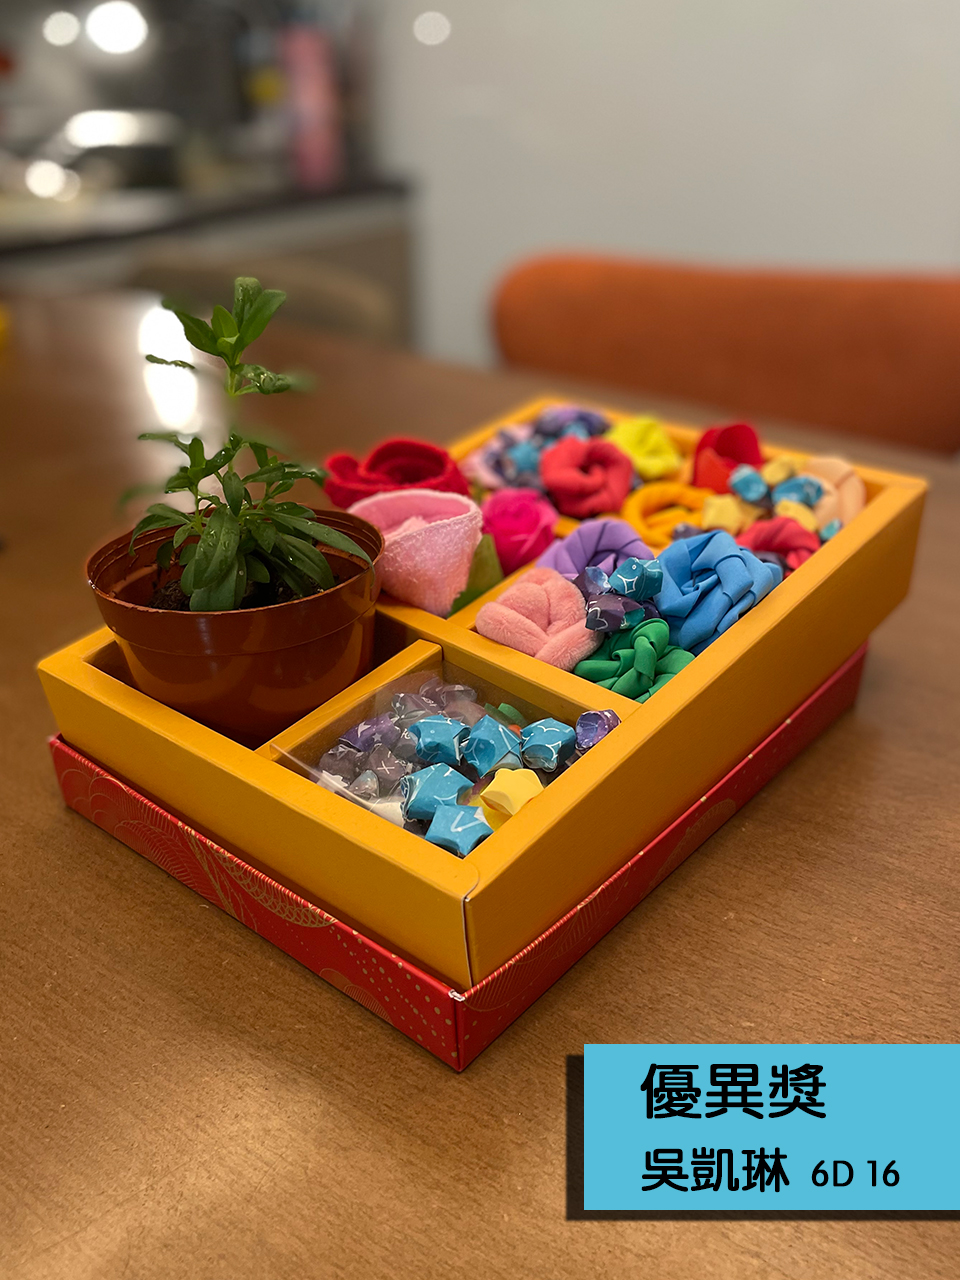 https://plkcjy.edu.hk/sites/default/files/you_yi_jiang_6d_16_wu_kai_lin_.jpg